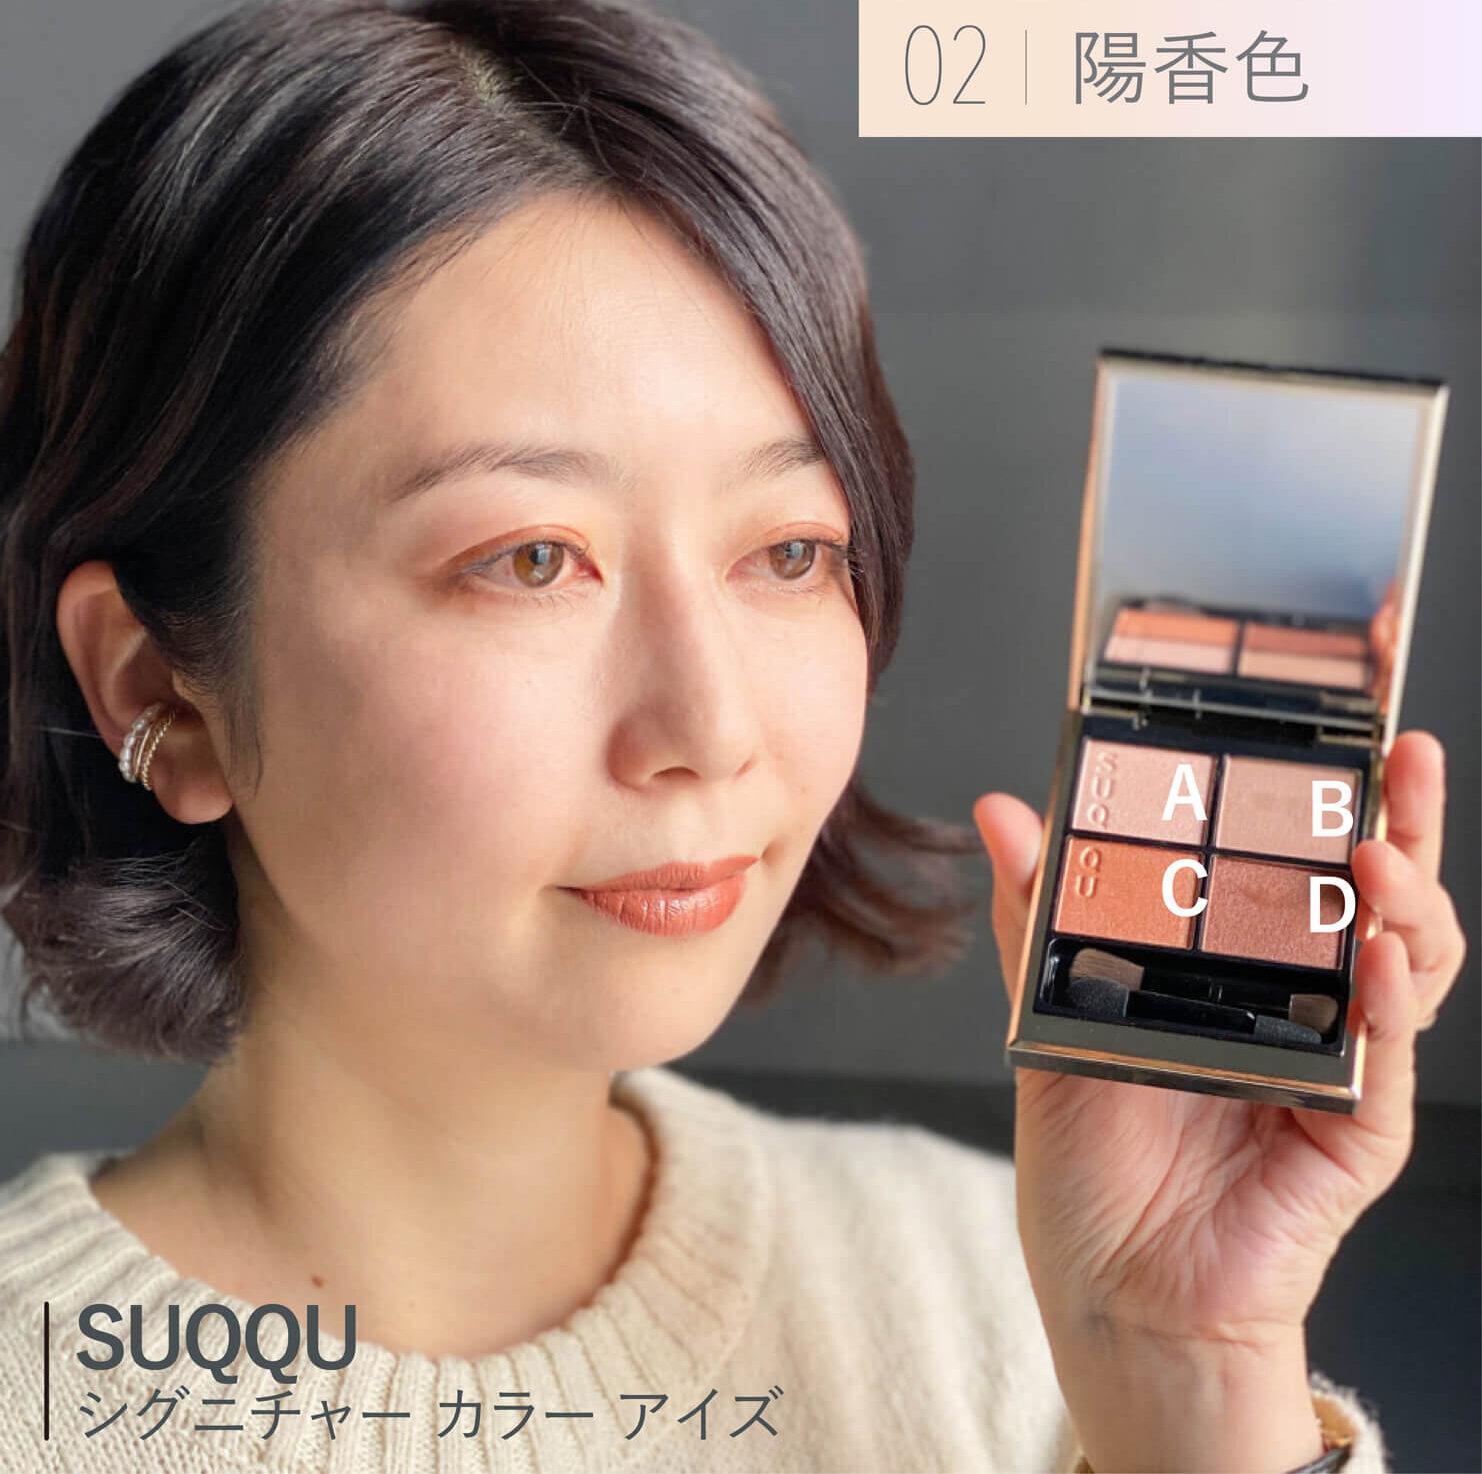 SUQQU シグニチャー カラー アイズ 【02 陽香色】